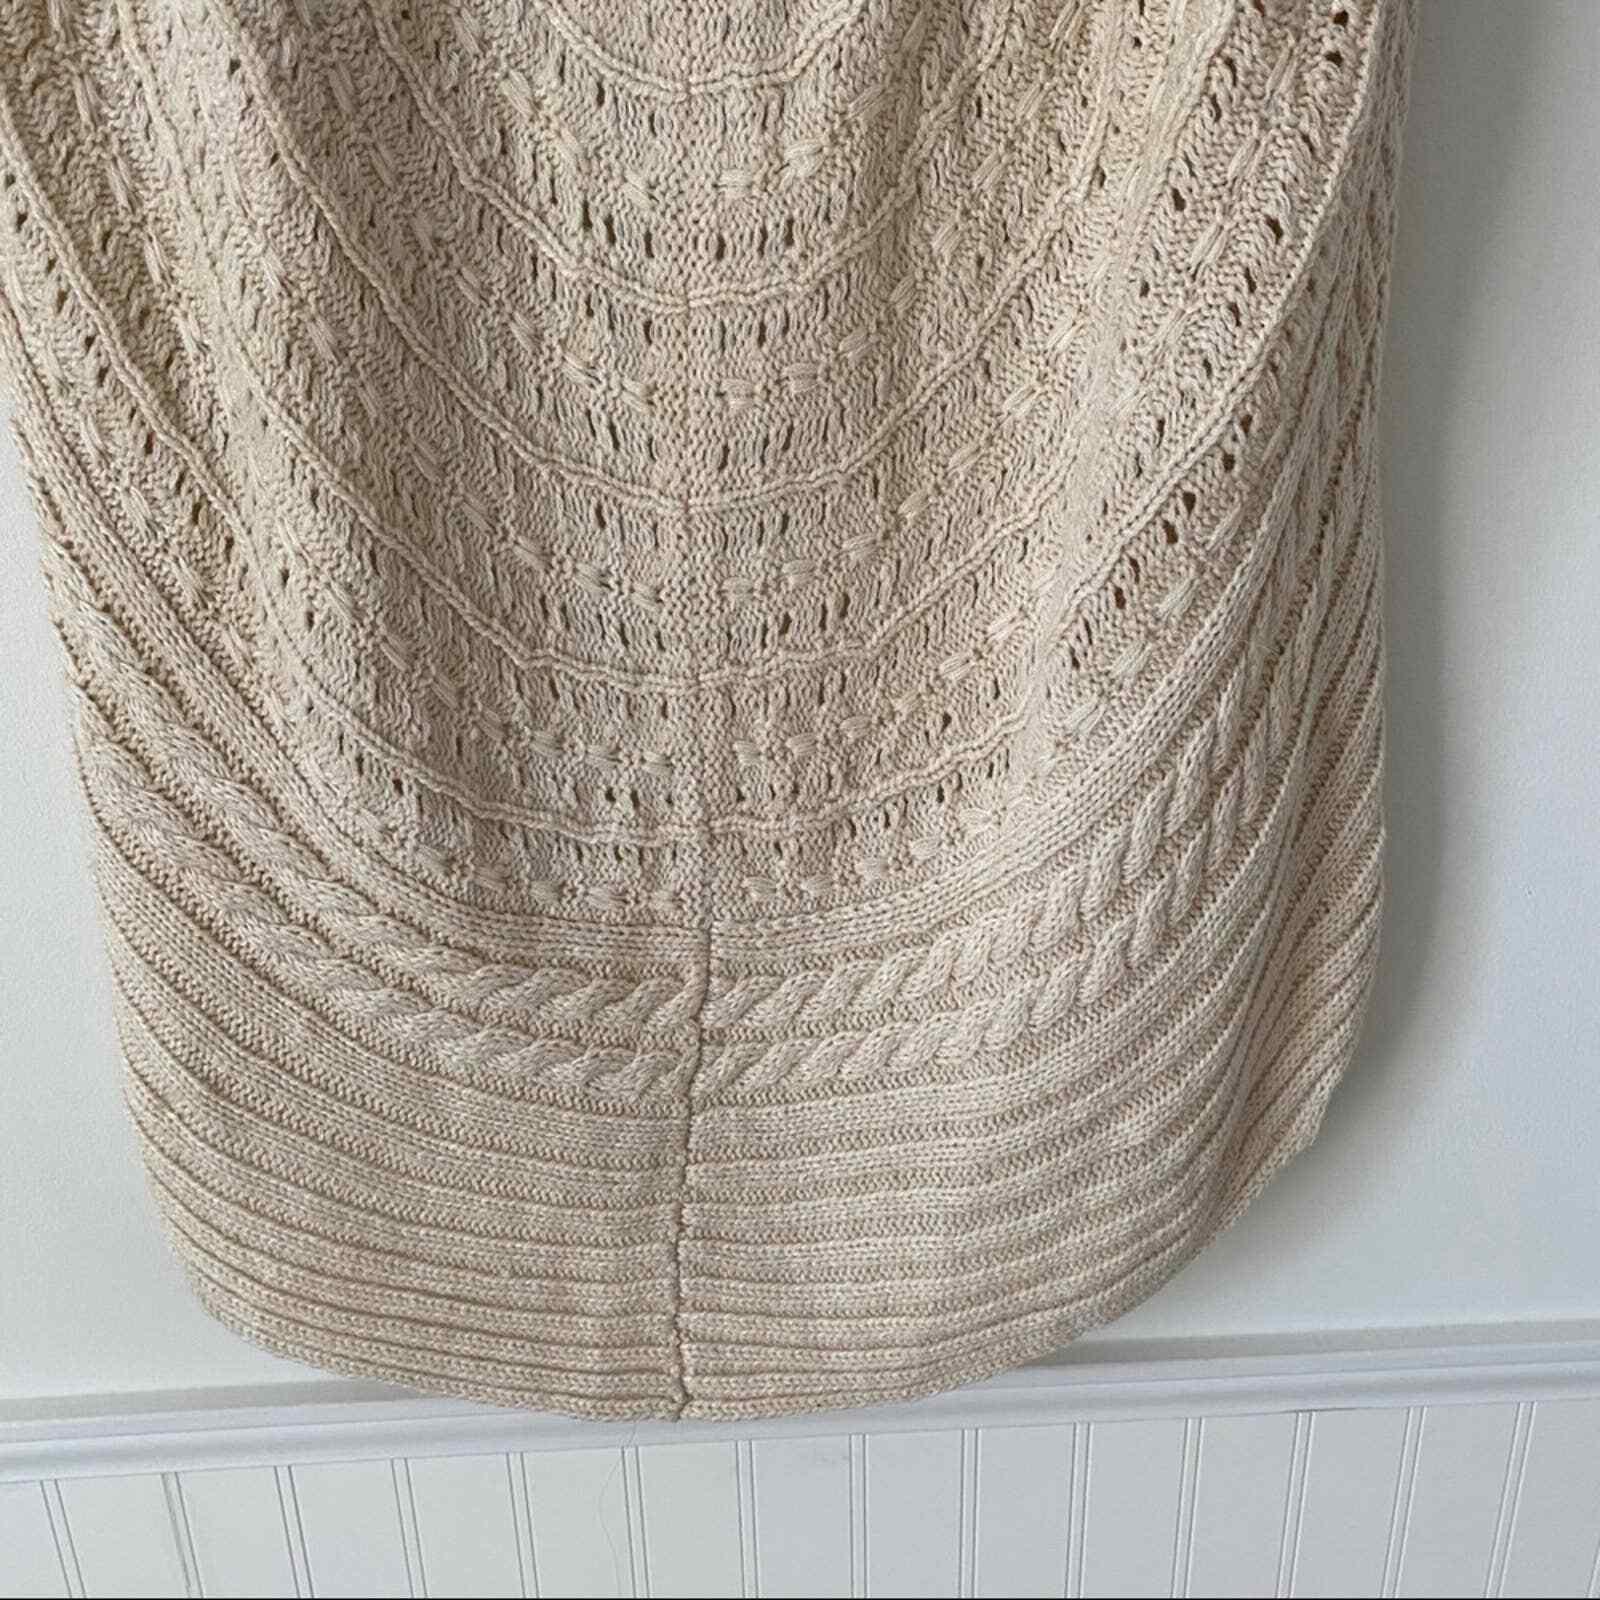 Flying Tomato Cream Lace Crochet Sweater Vest - image 7